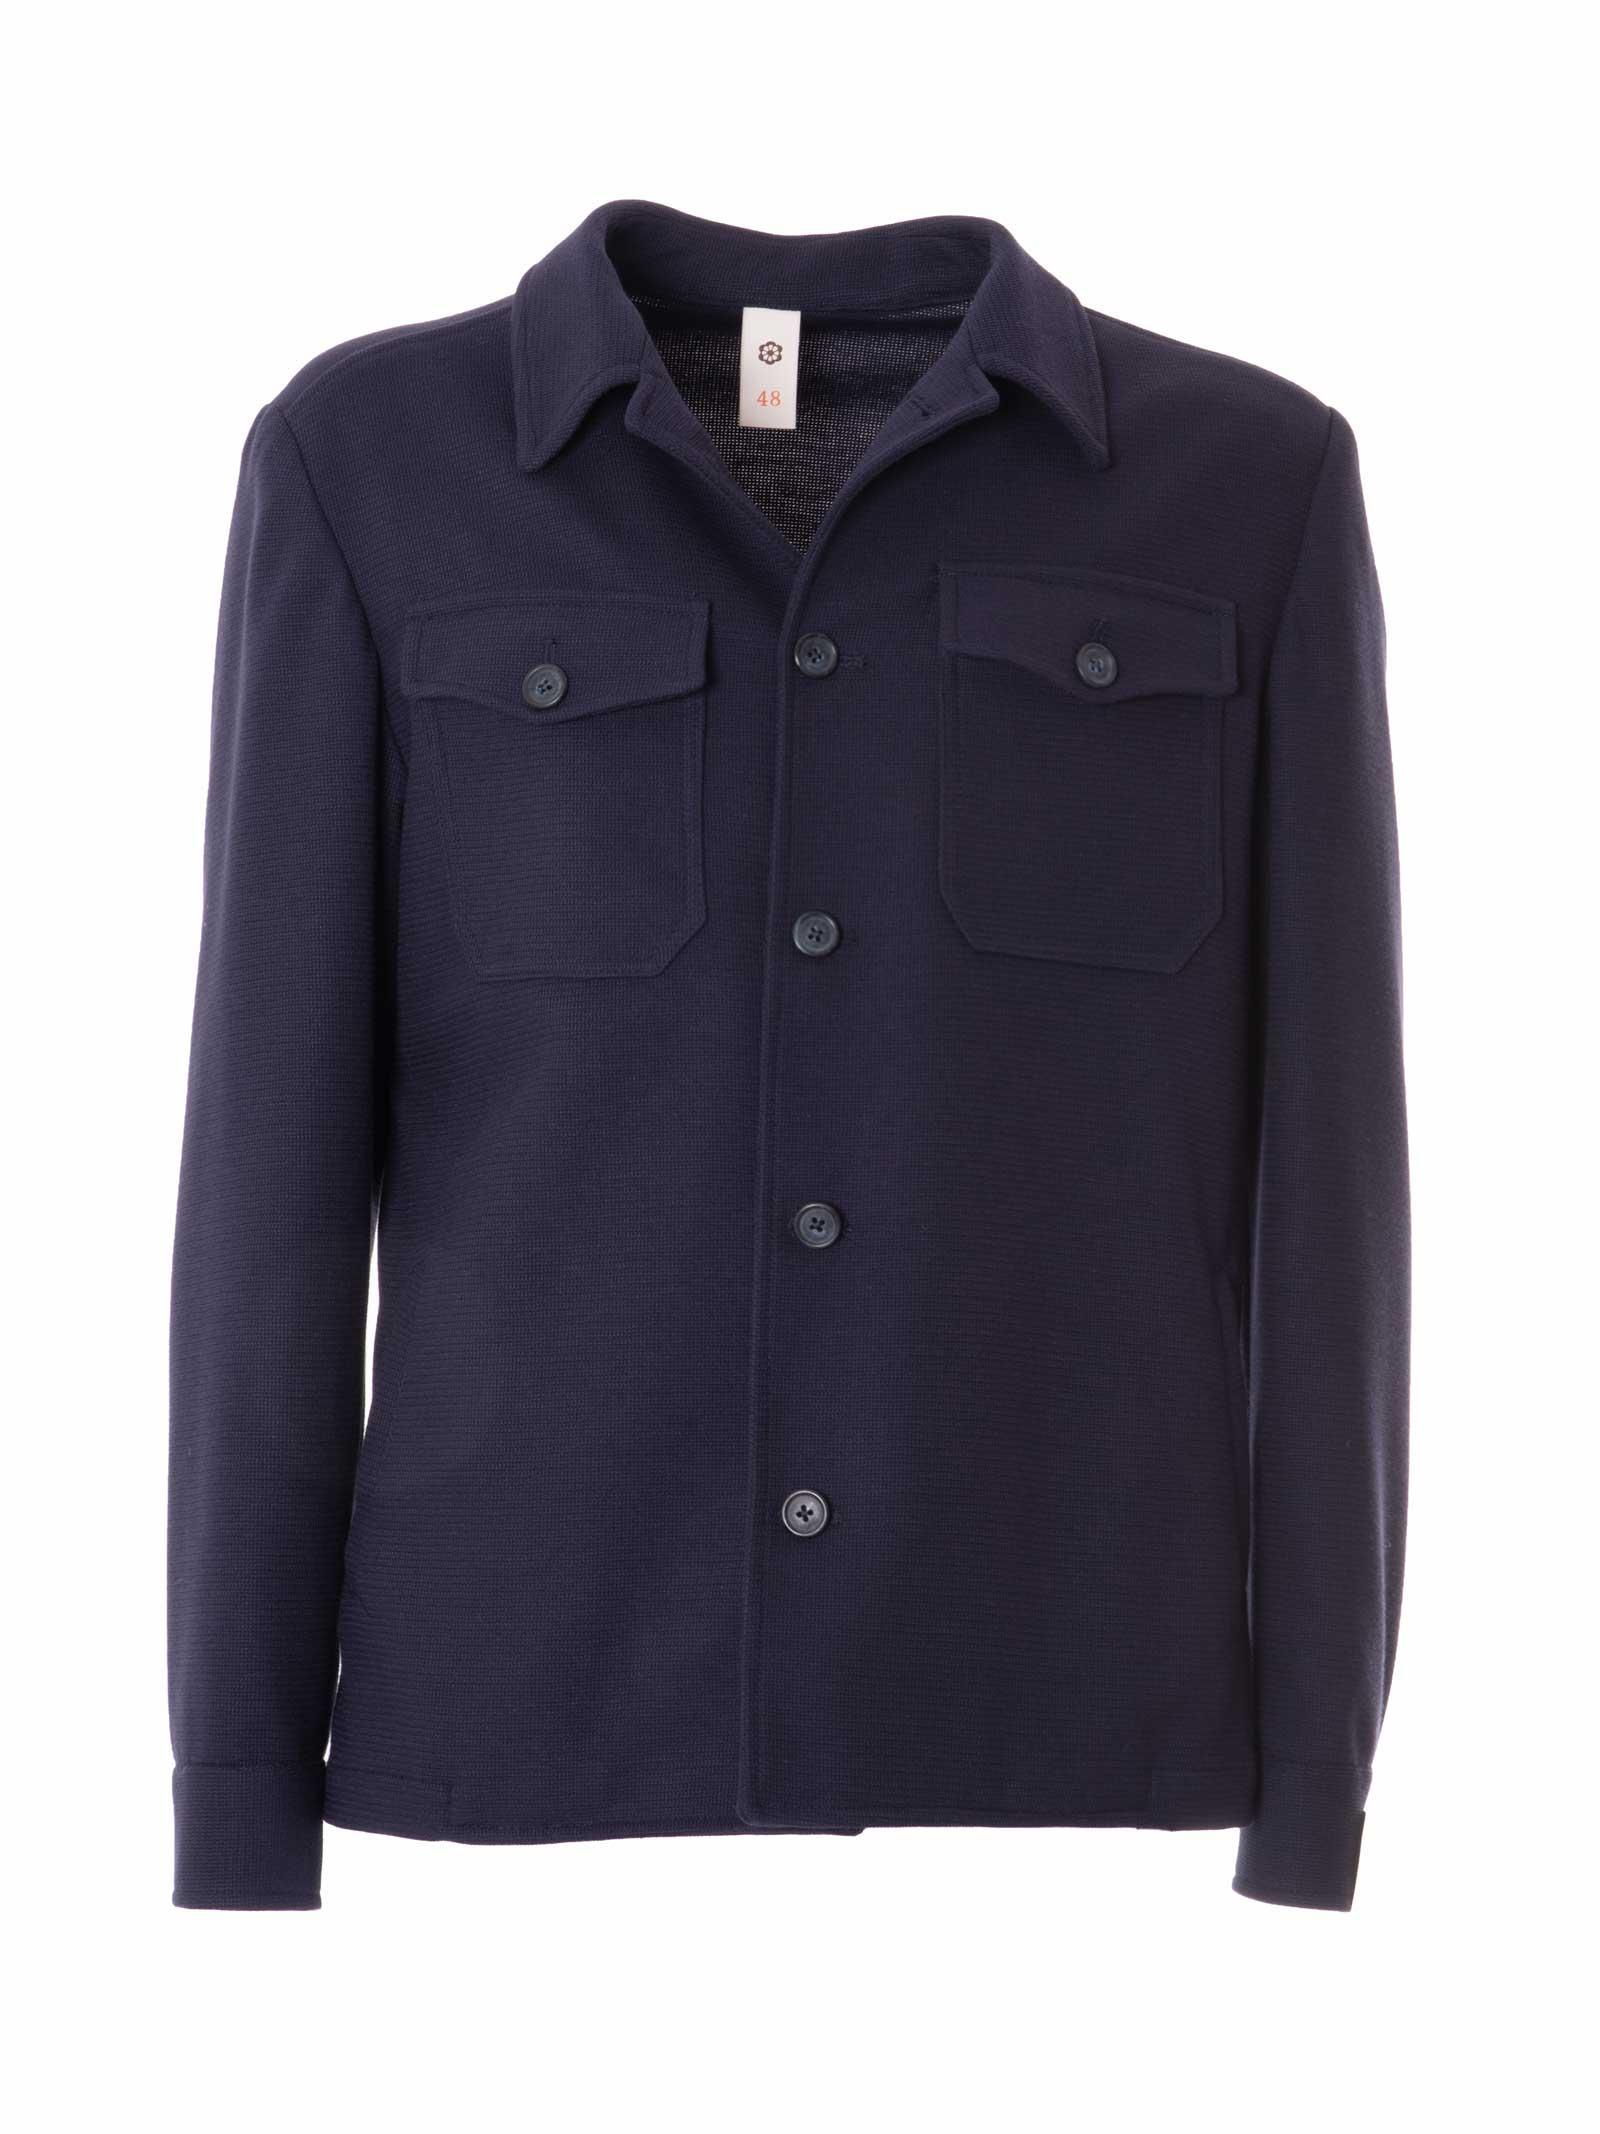 giacca/camicia in maglia GABARDINE   GABCAMYCOL.63